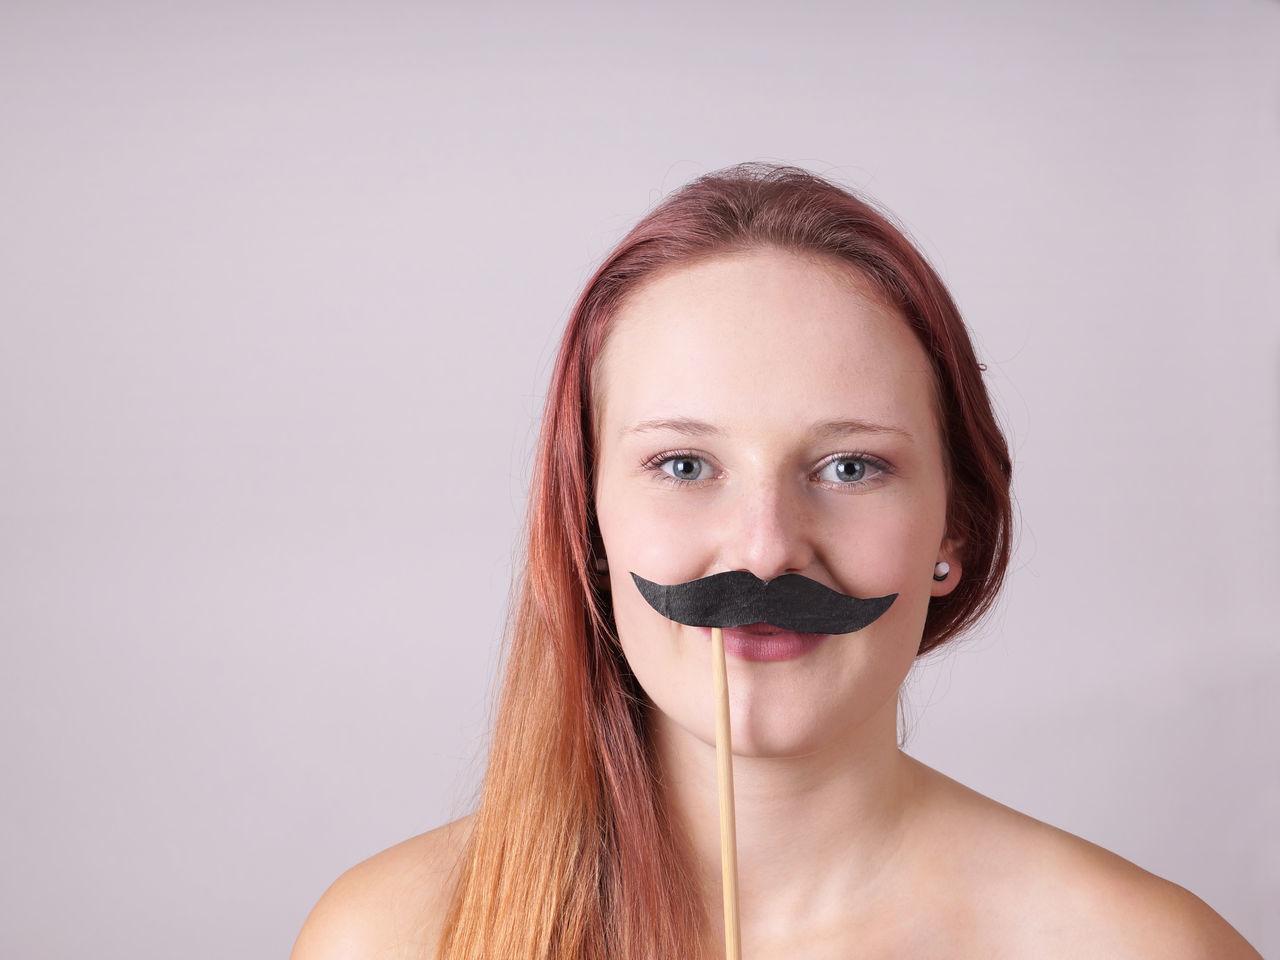 Beautiful stock photos of schnurrbart,  18-19 Years,  Blond Hair,  Caucasian Ethnicity,  Fashion